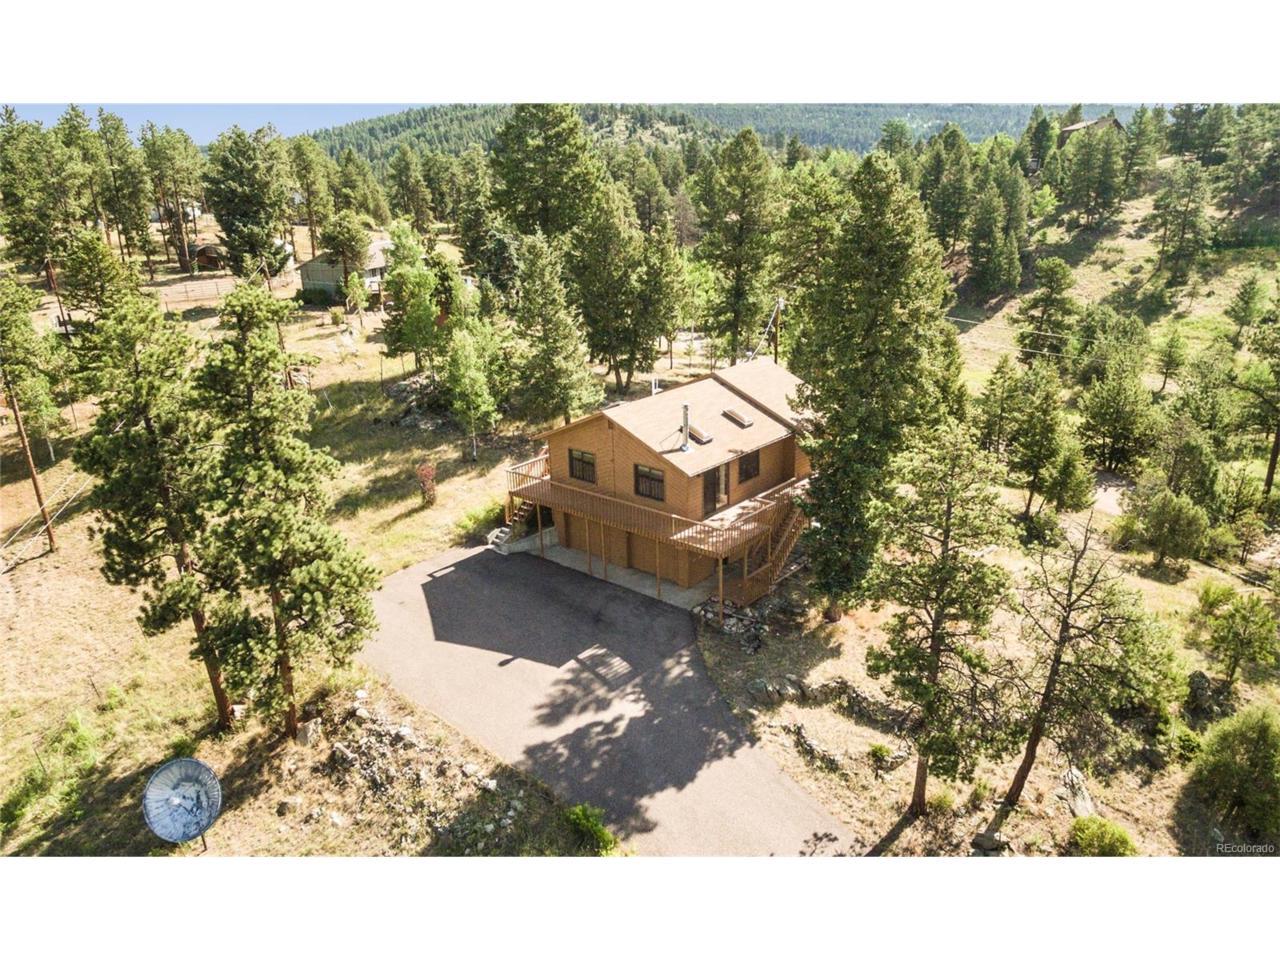 13606 Wamblee Trail, Conifer, CO 80433 (MLS #6183665) :: 8z Real Estate